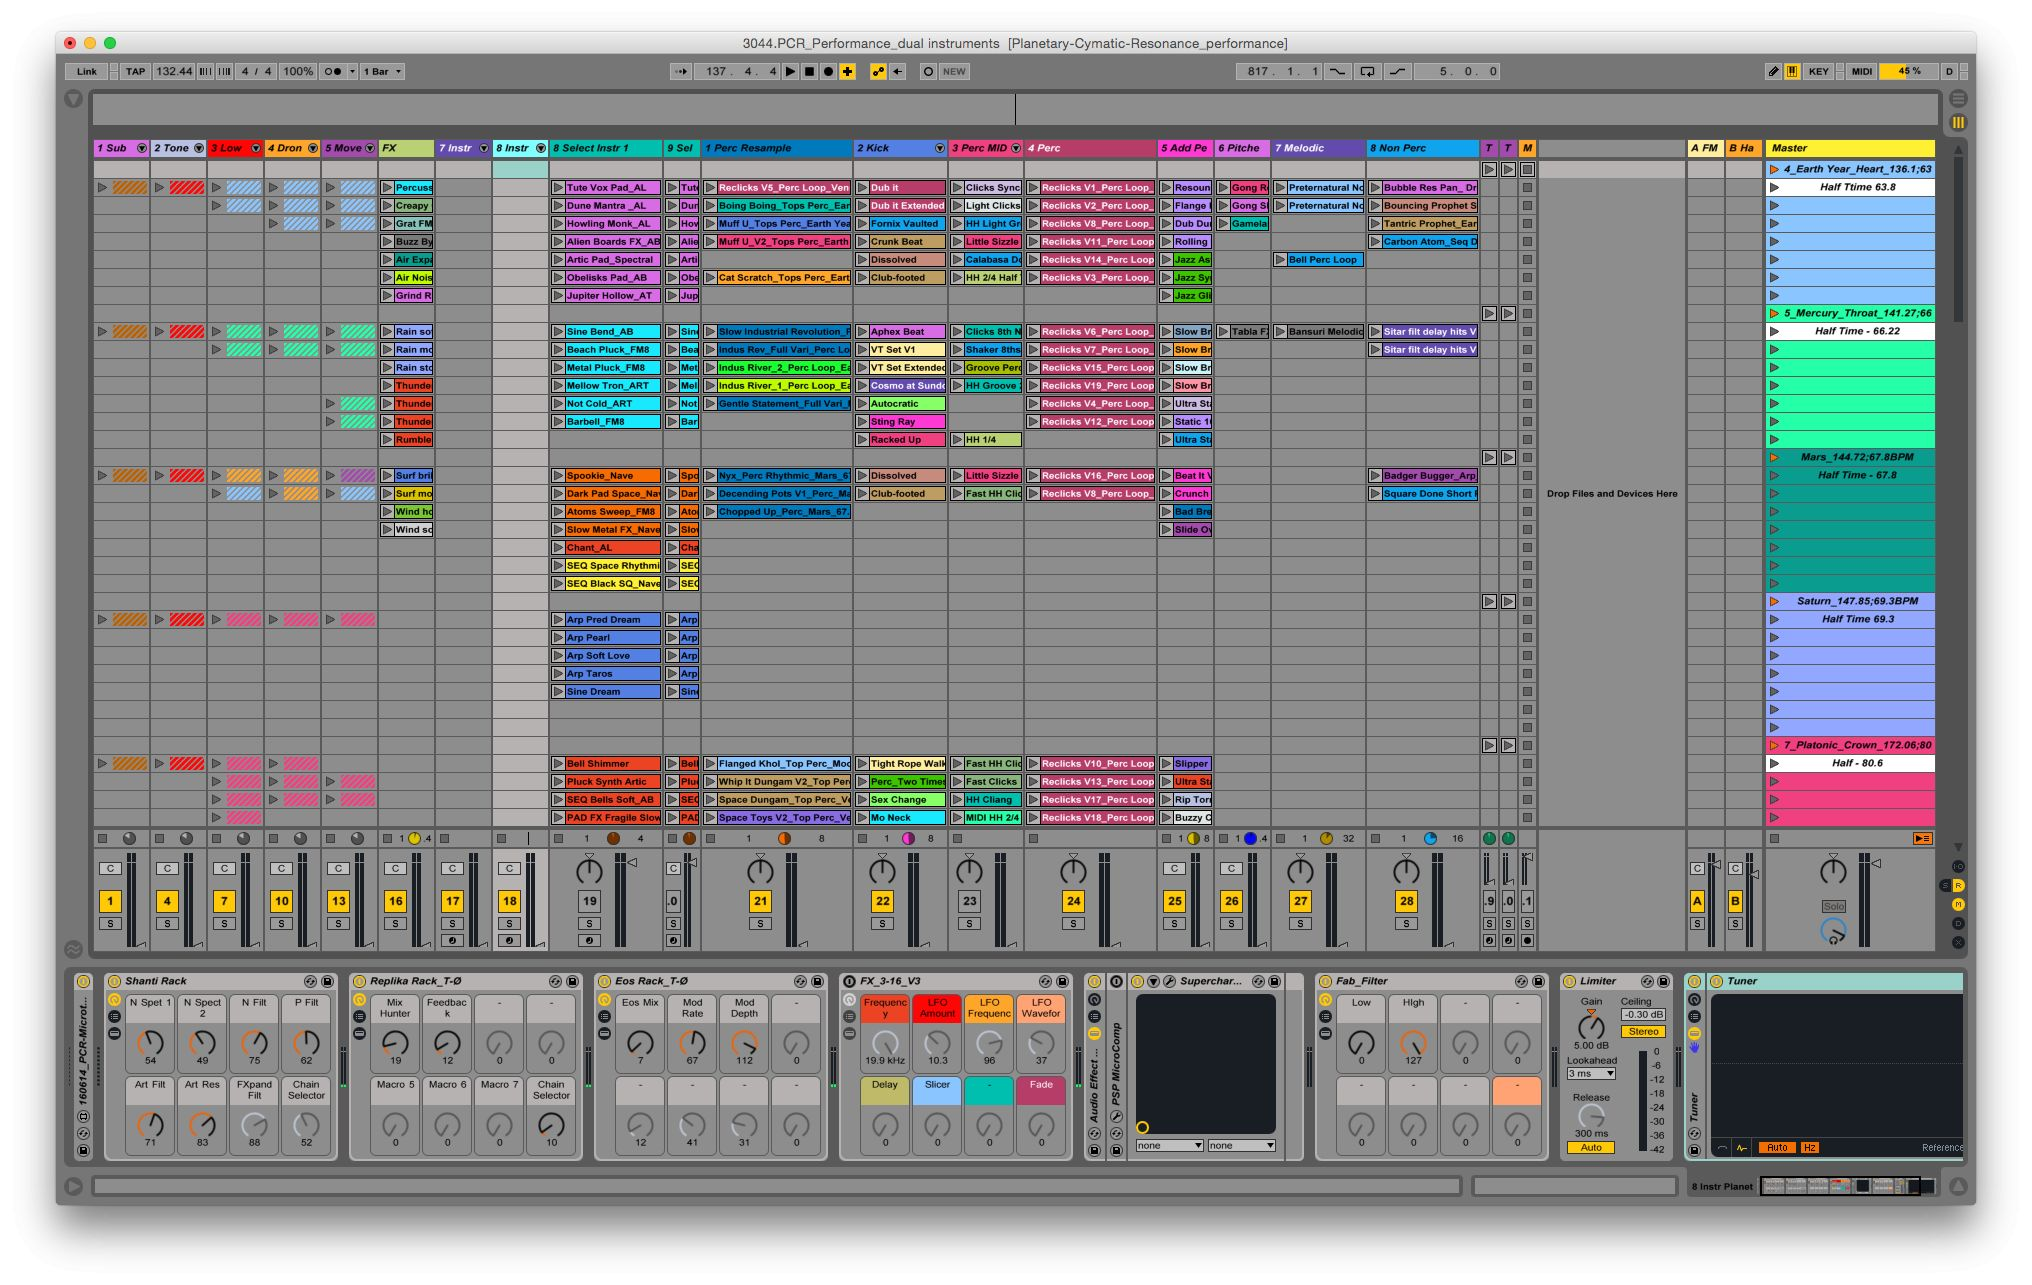 Ableton Live performance setup